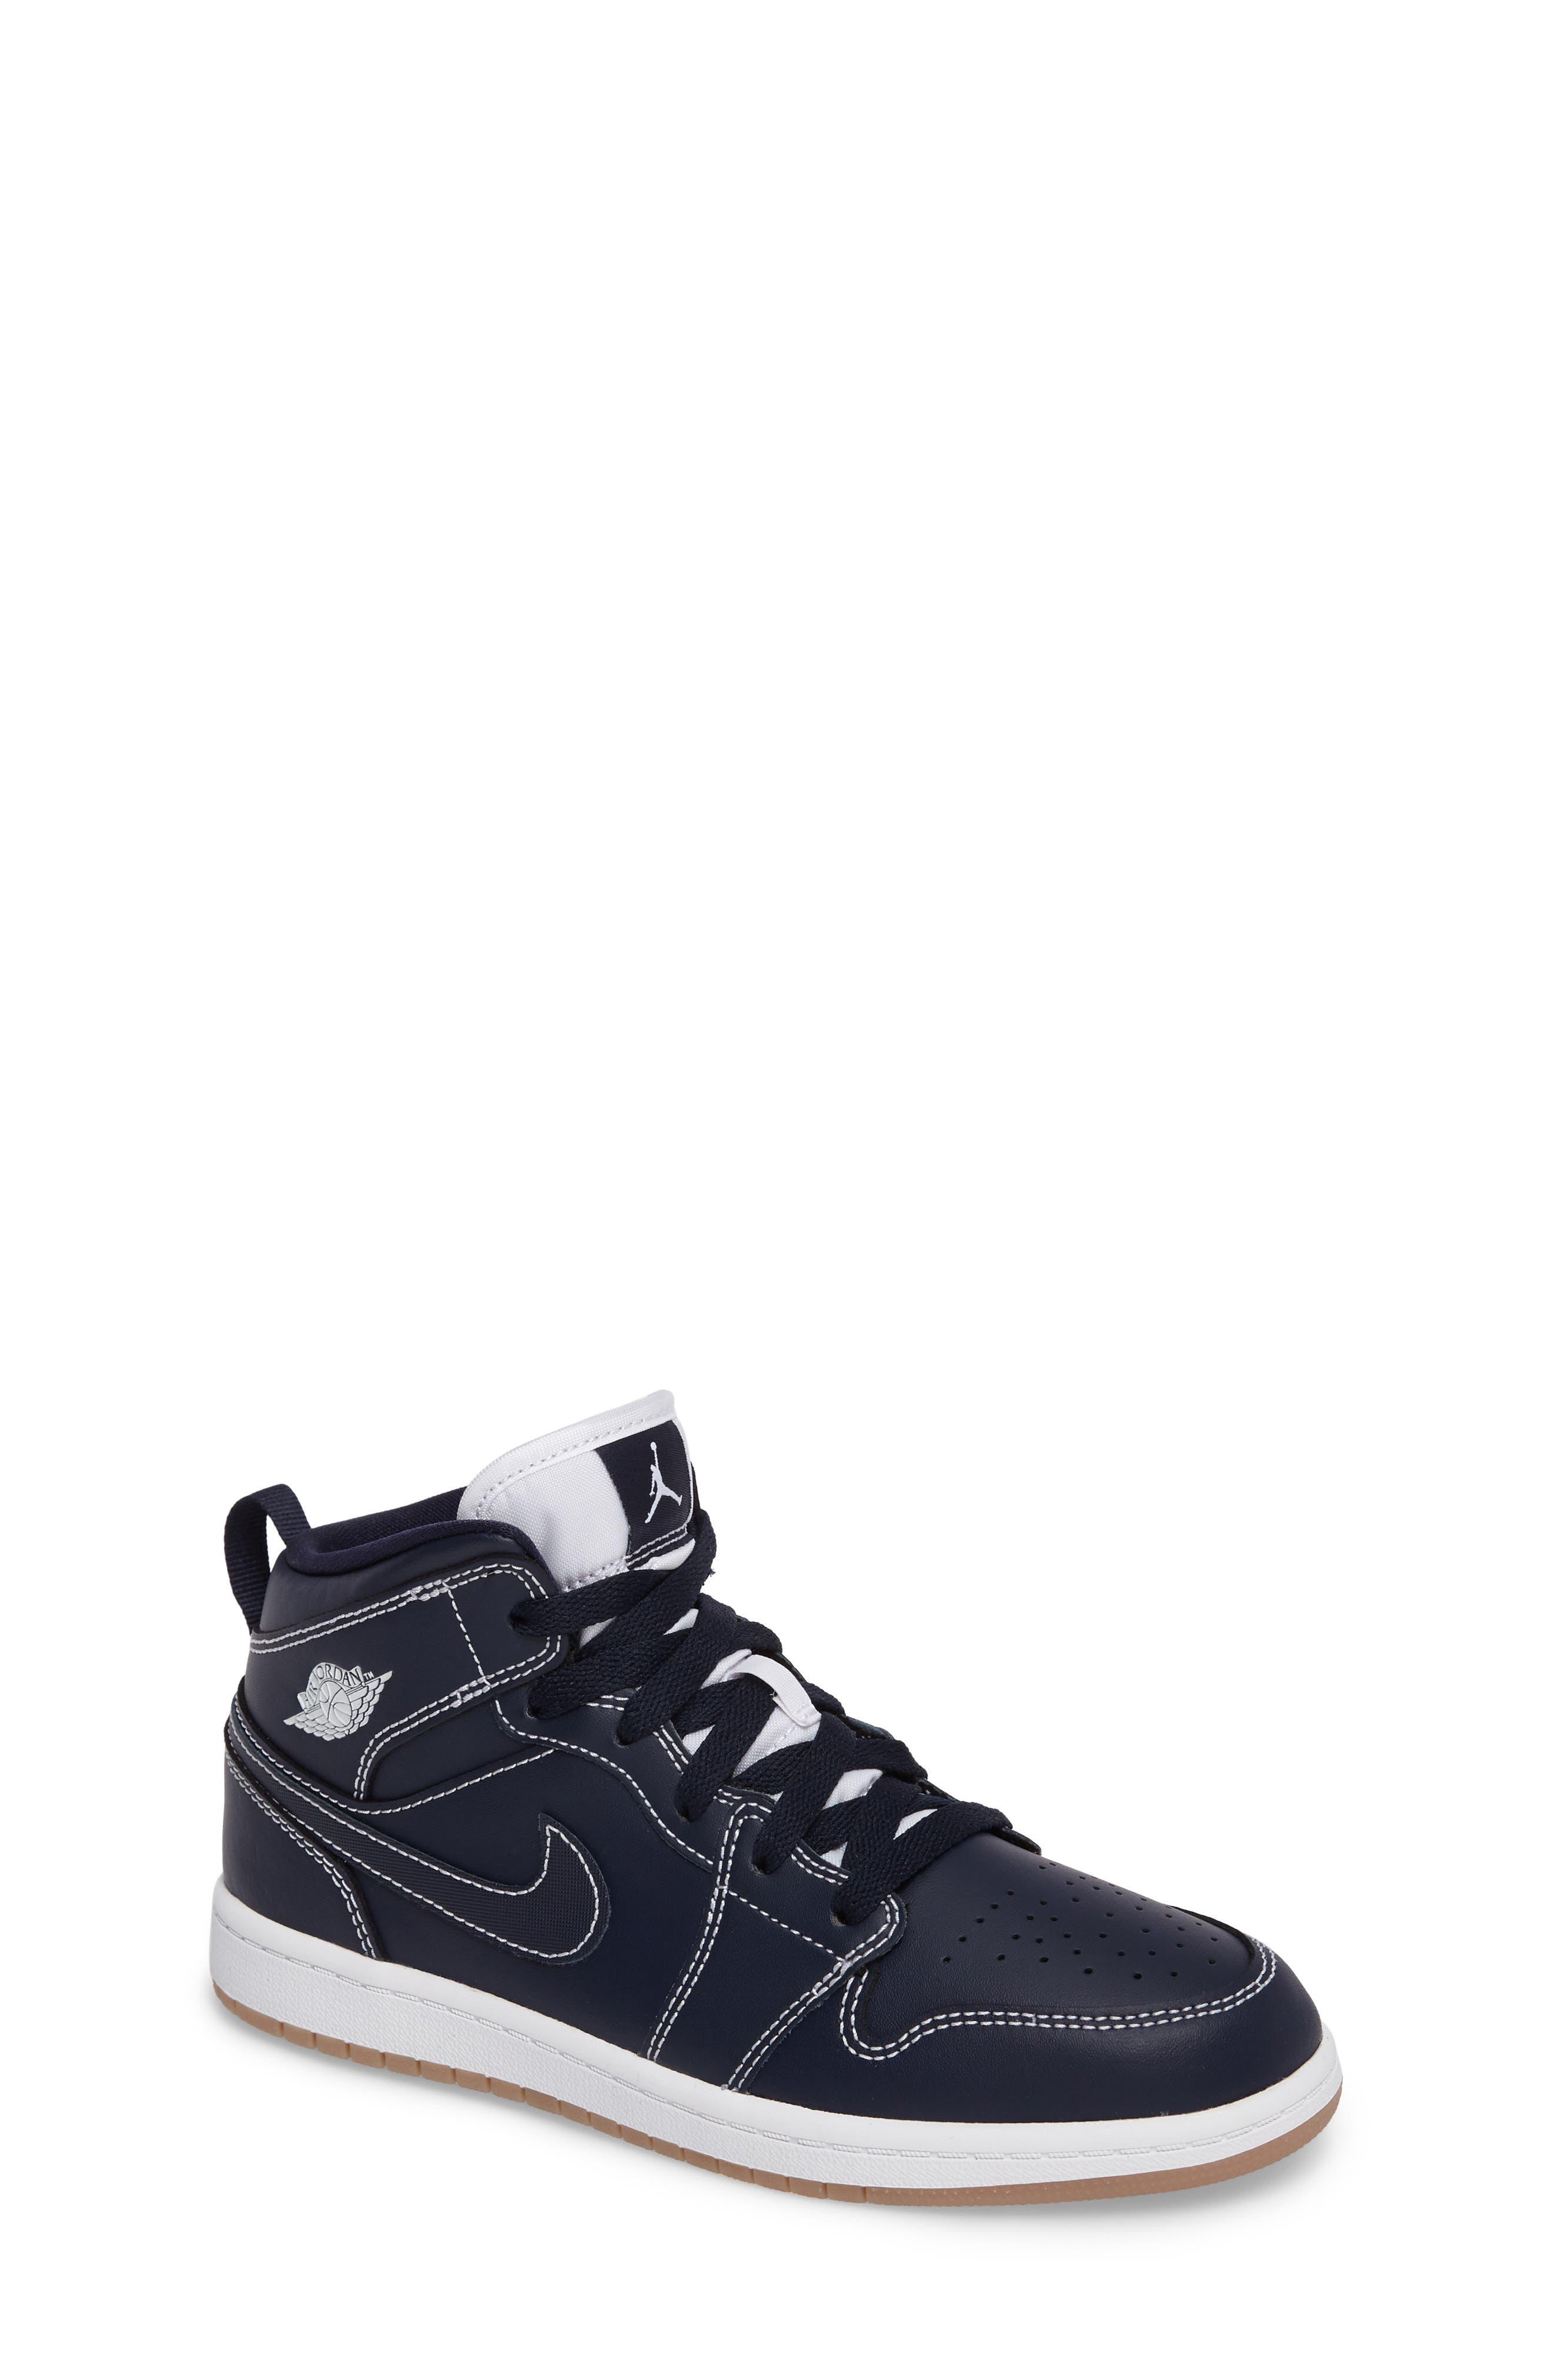 'Air Jordan 1' Mid Sneaker,                             Main thumbnail 1, color,                             Obsidian/ White